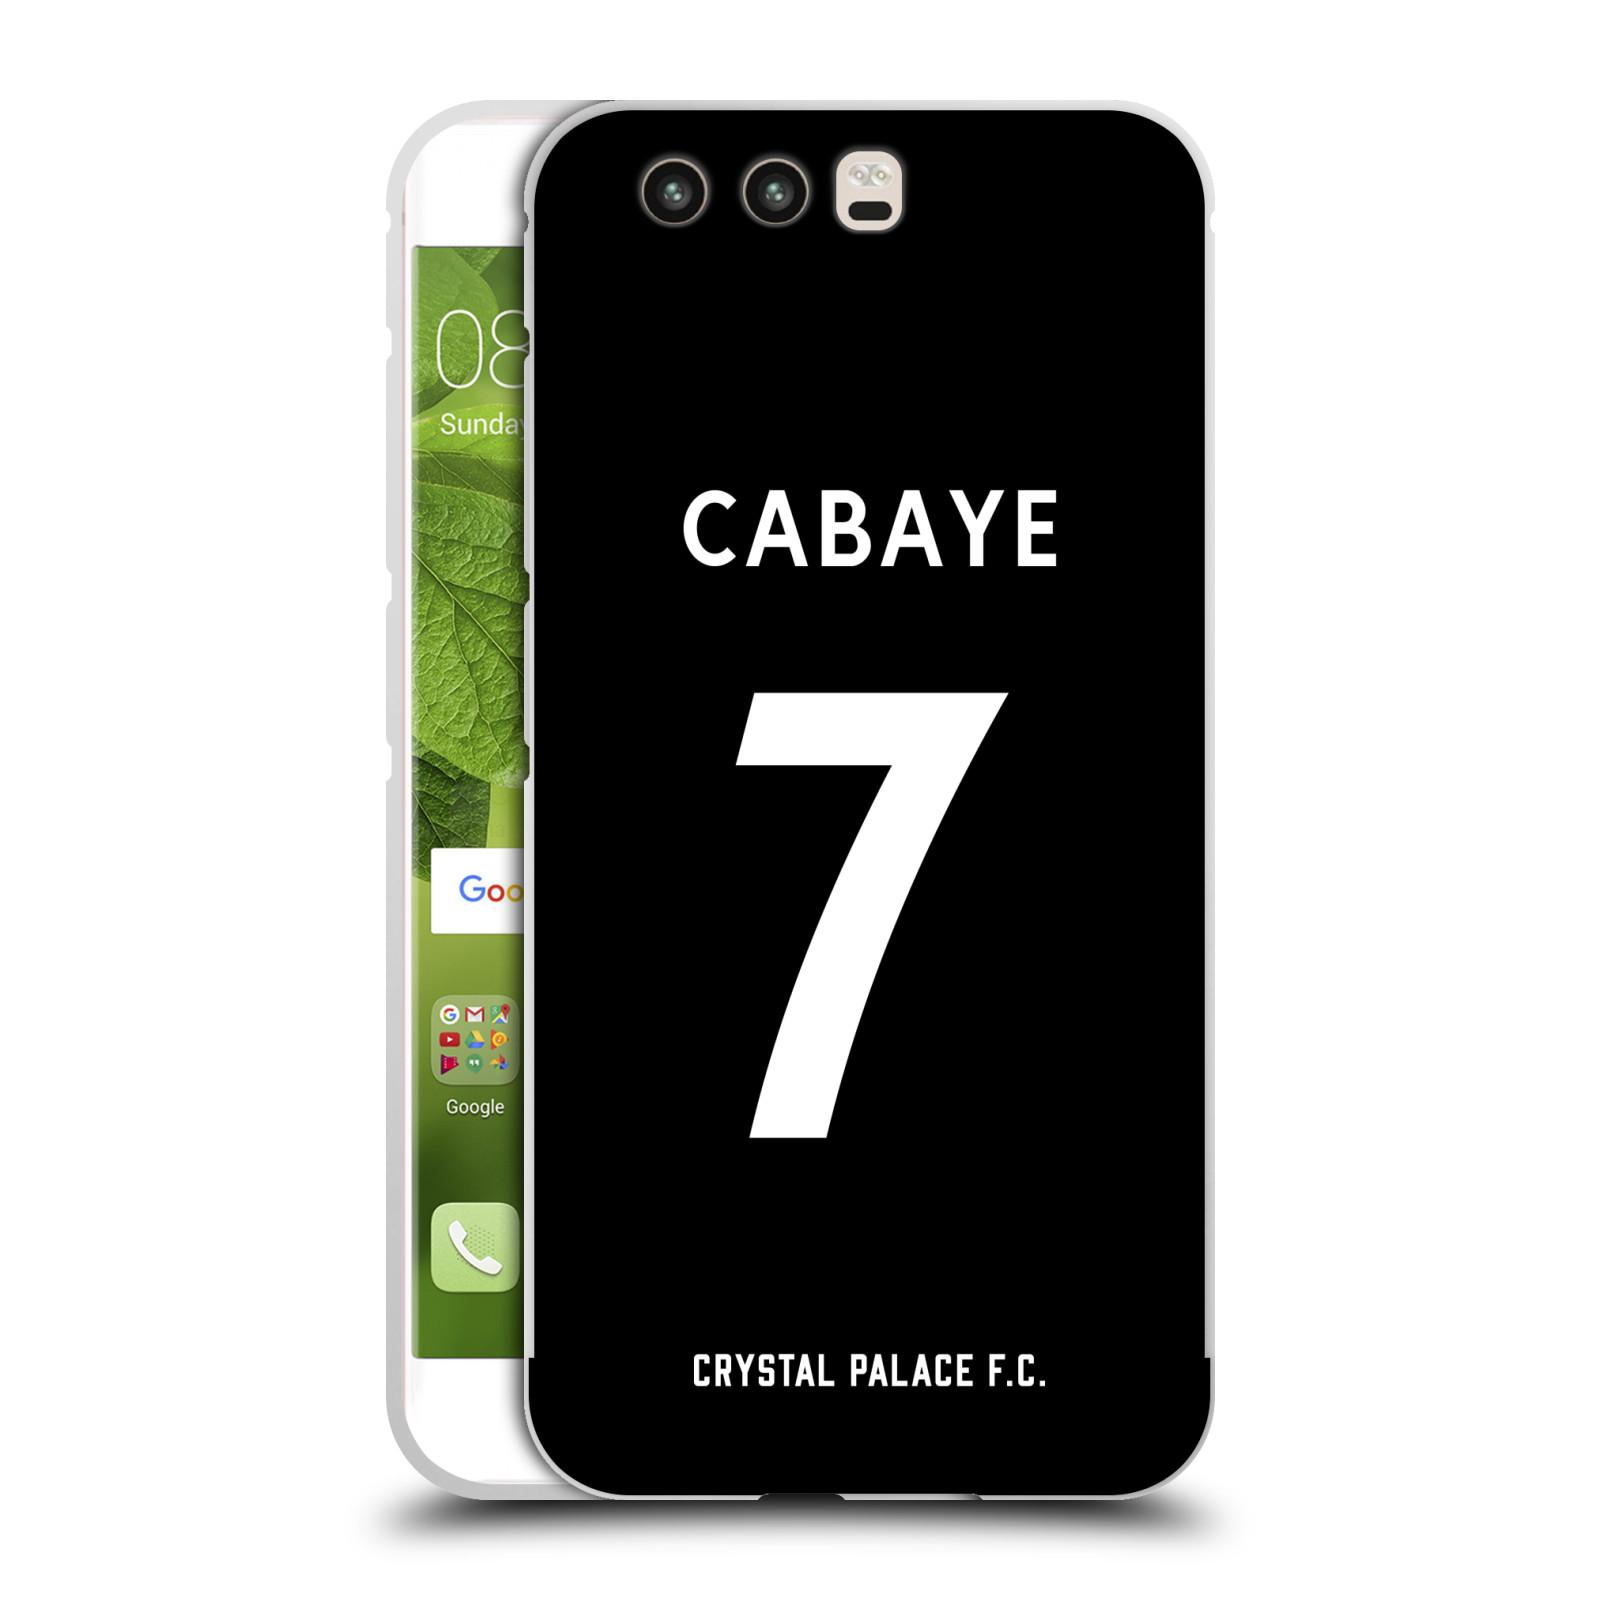 CRYSTAL-PALACE-FC-2017-18-AWAY-KIT-1-SILVER-METALLIC-ALUMINIUM-FOR-HUAWEI-PHONES